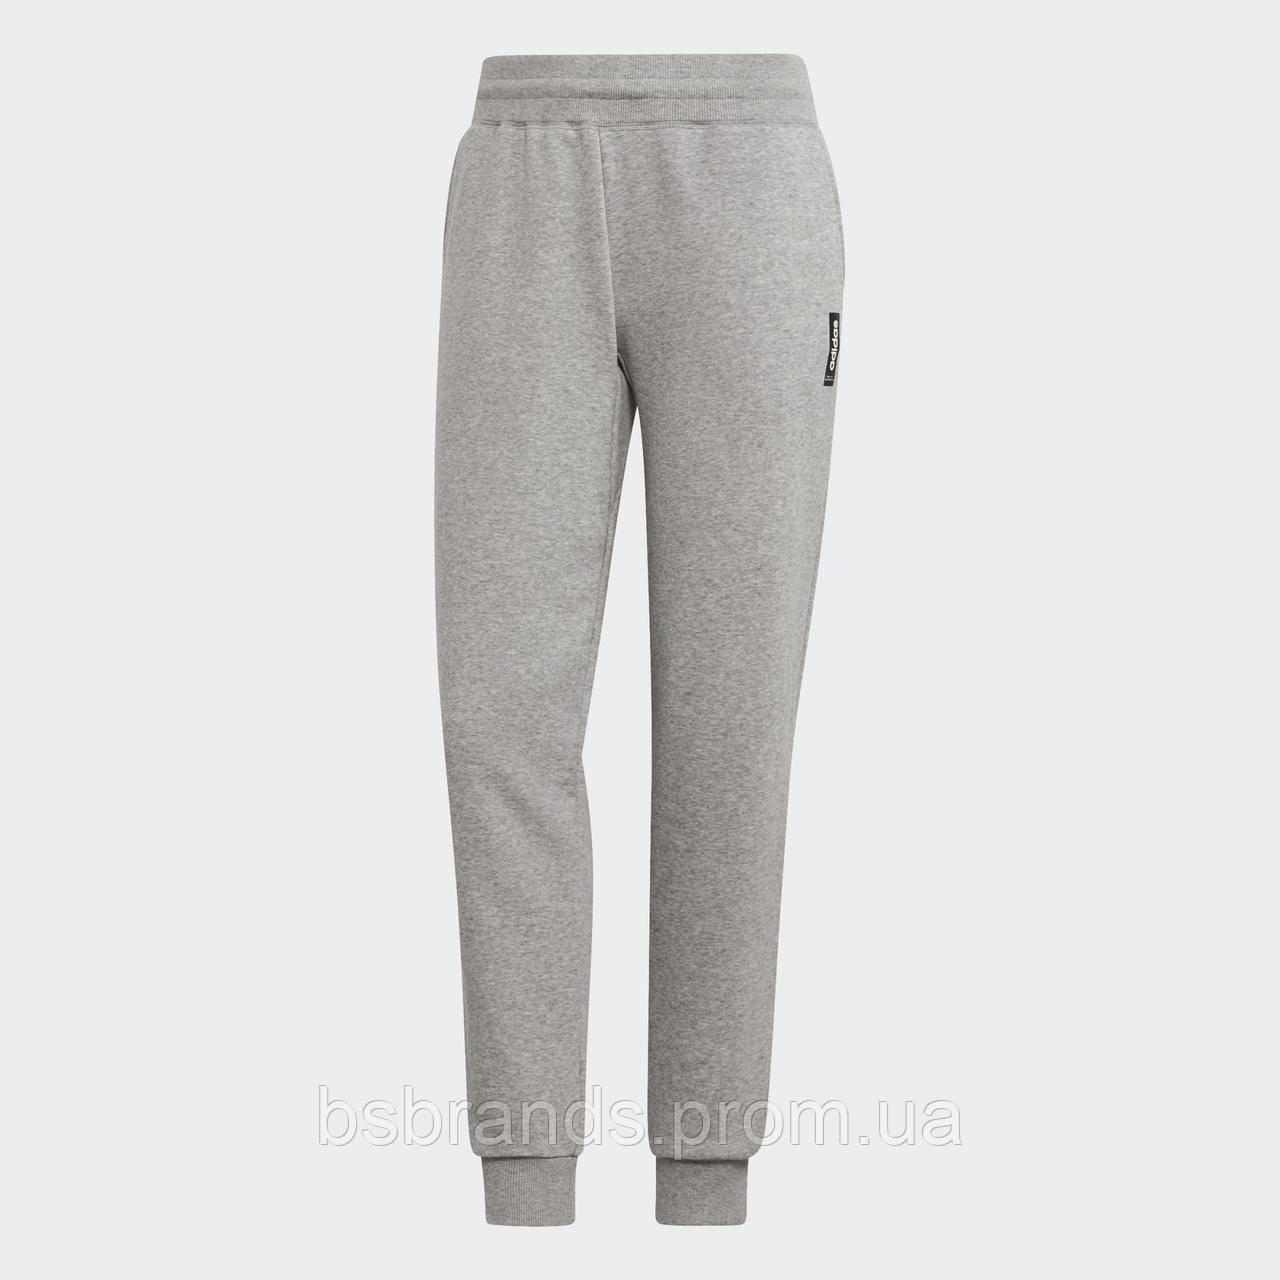 Женские штаны-джоггеры adidas Brilliant Basics EI4630